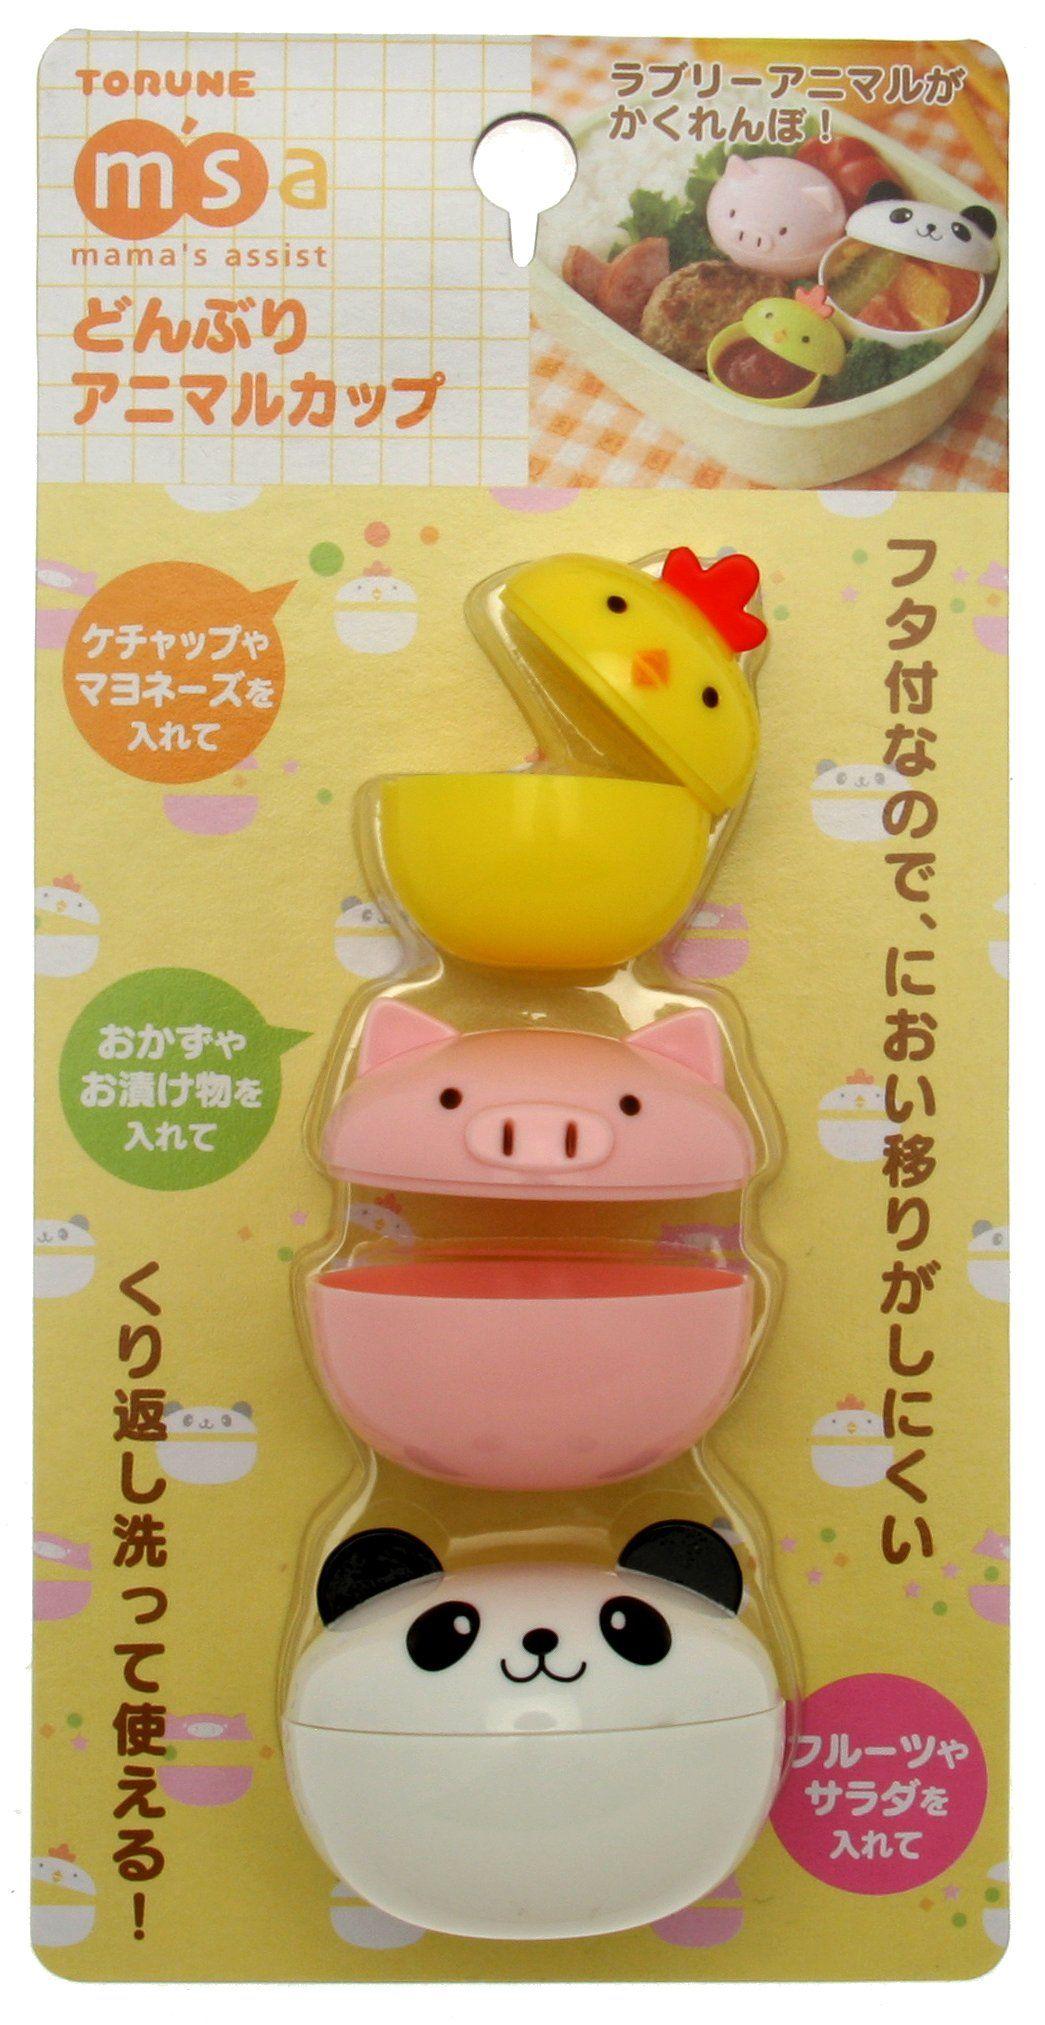 Panda Mini Condiment Containers for Bento Box Piggy and Chick